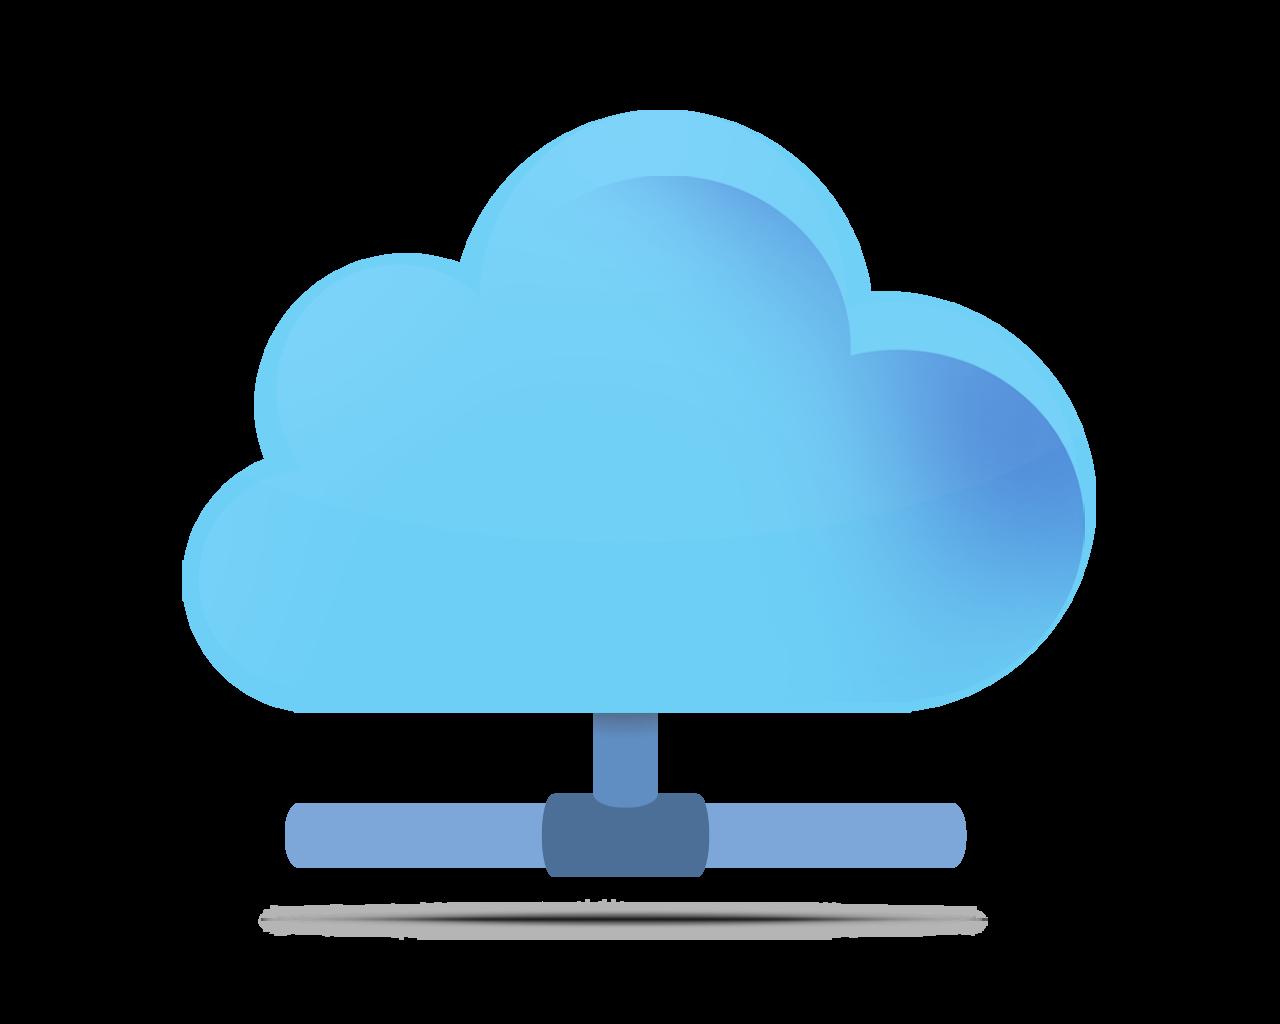 Computing panda free images. Clipart cloud computer